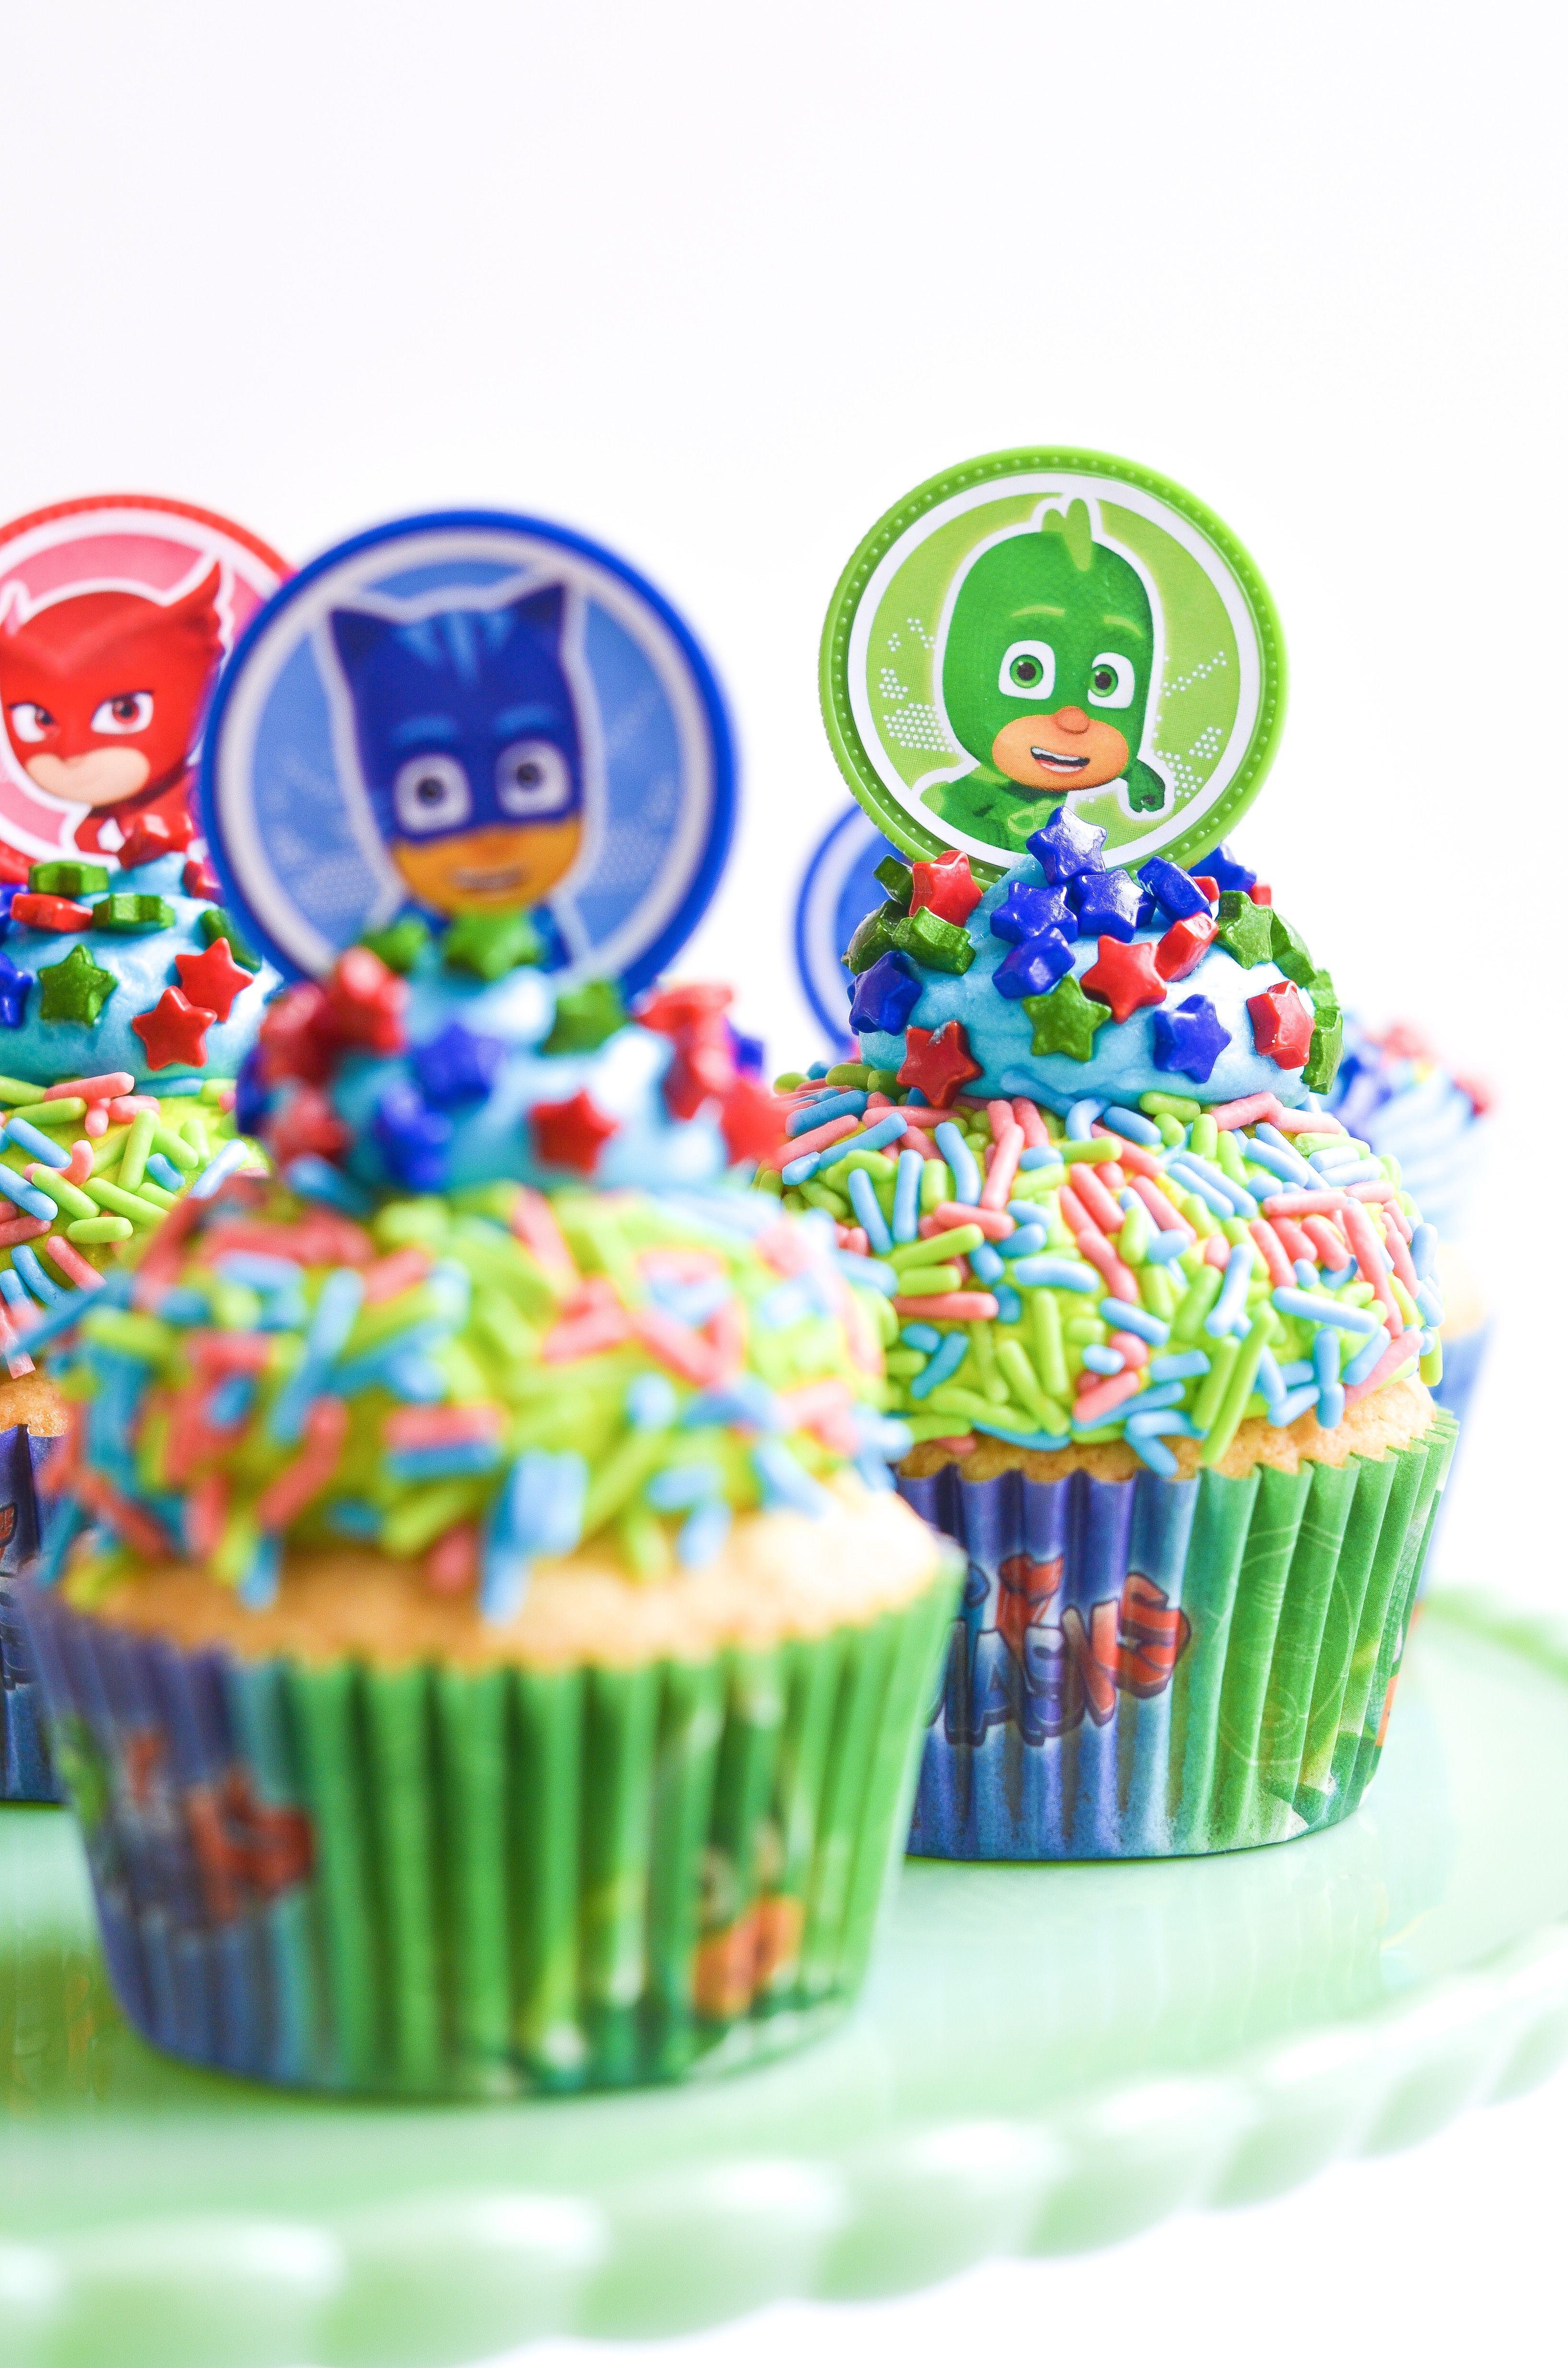 Food pj masks birthday cake pj mask cupcakes cupcake party